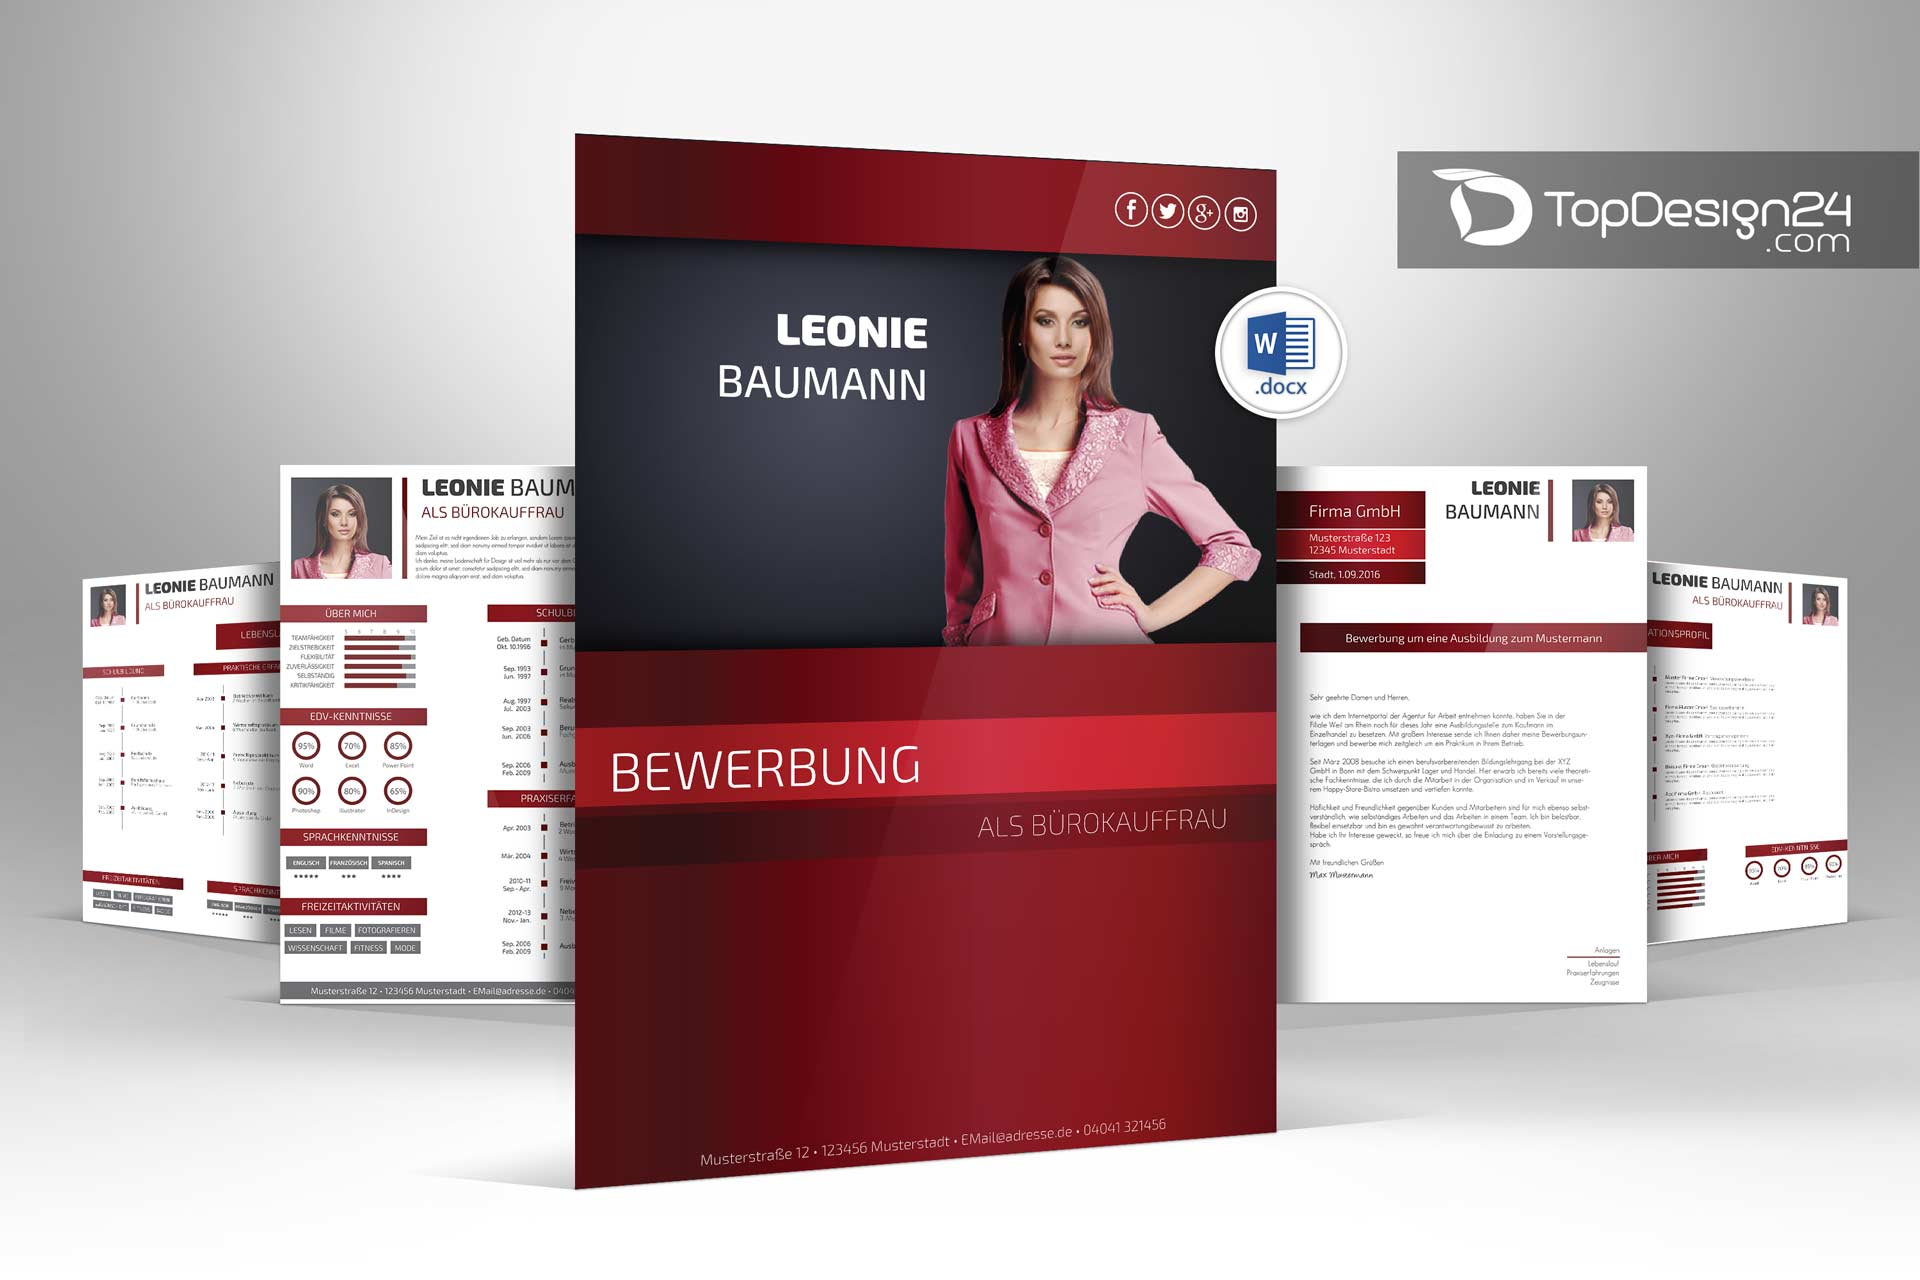 online bewerbung design email · deckblatt design bewerbung